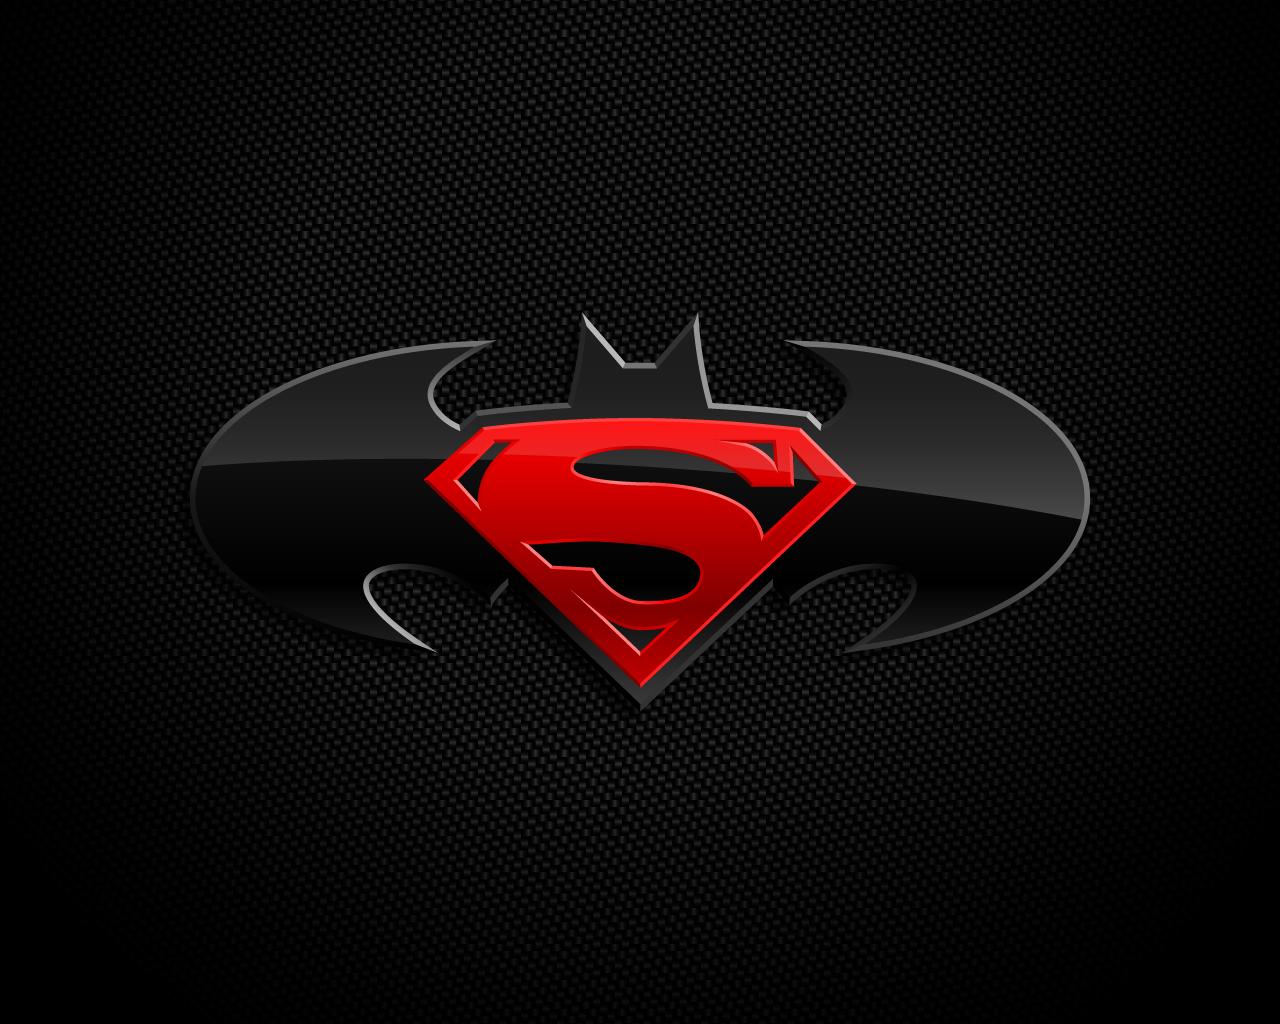 Superman Batman 1280x1024